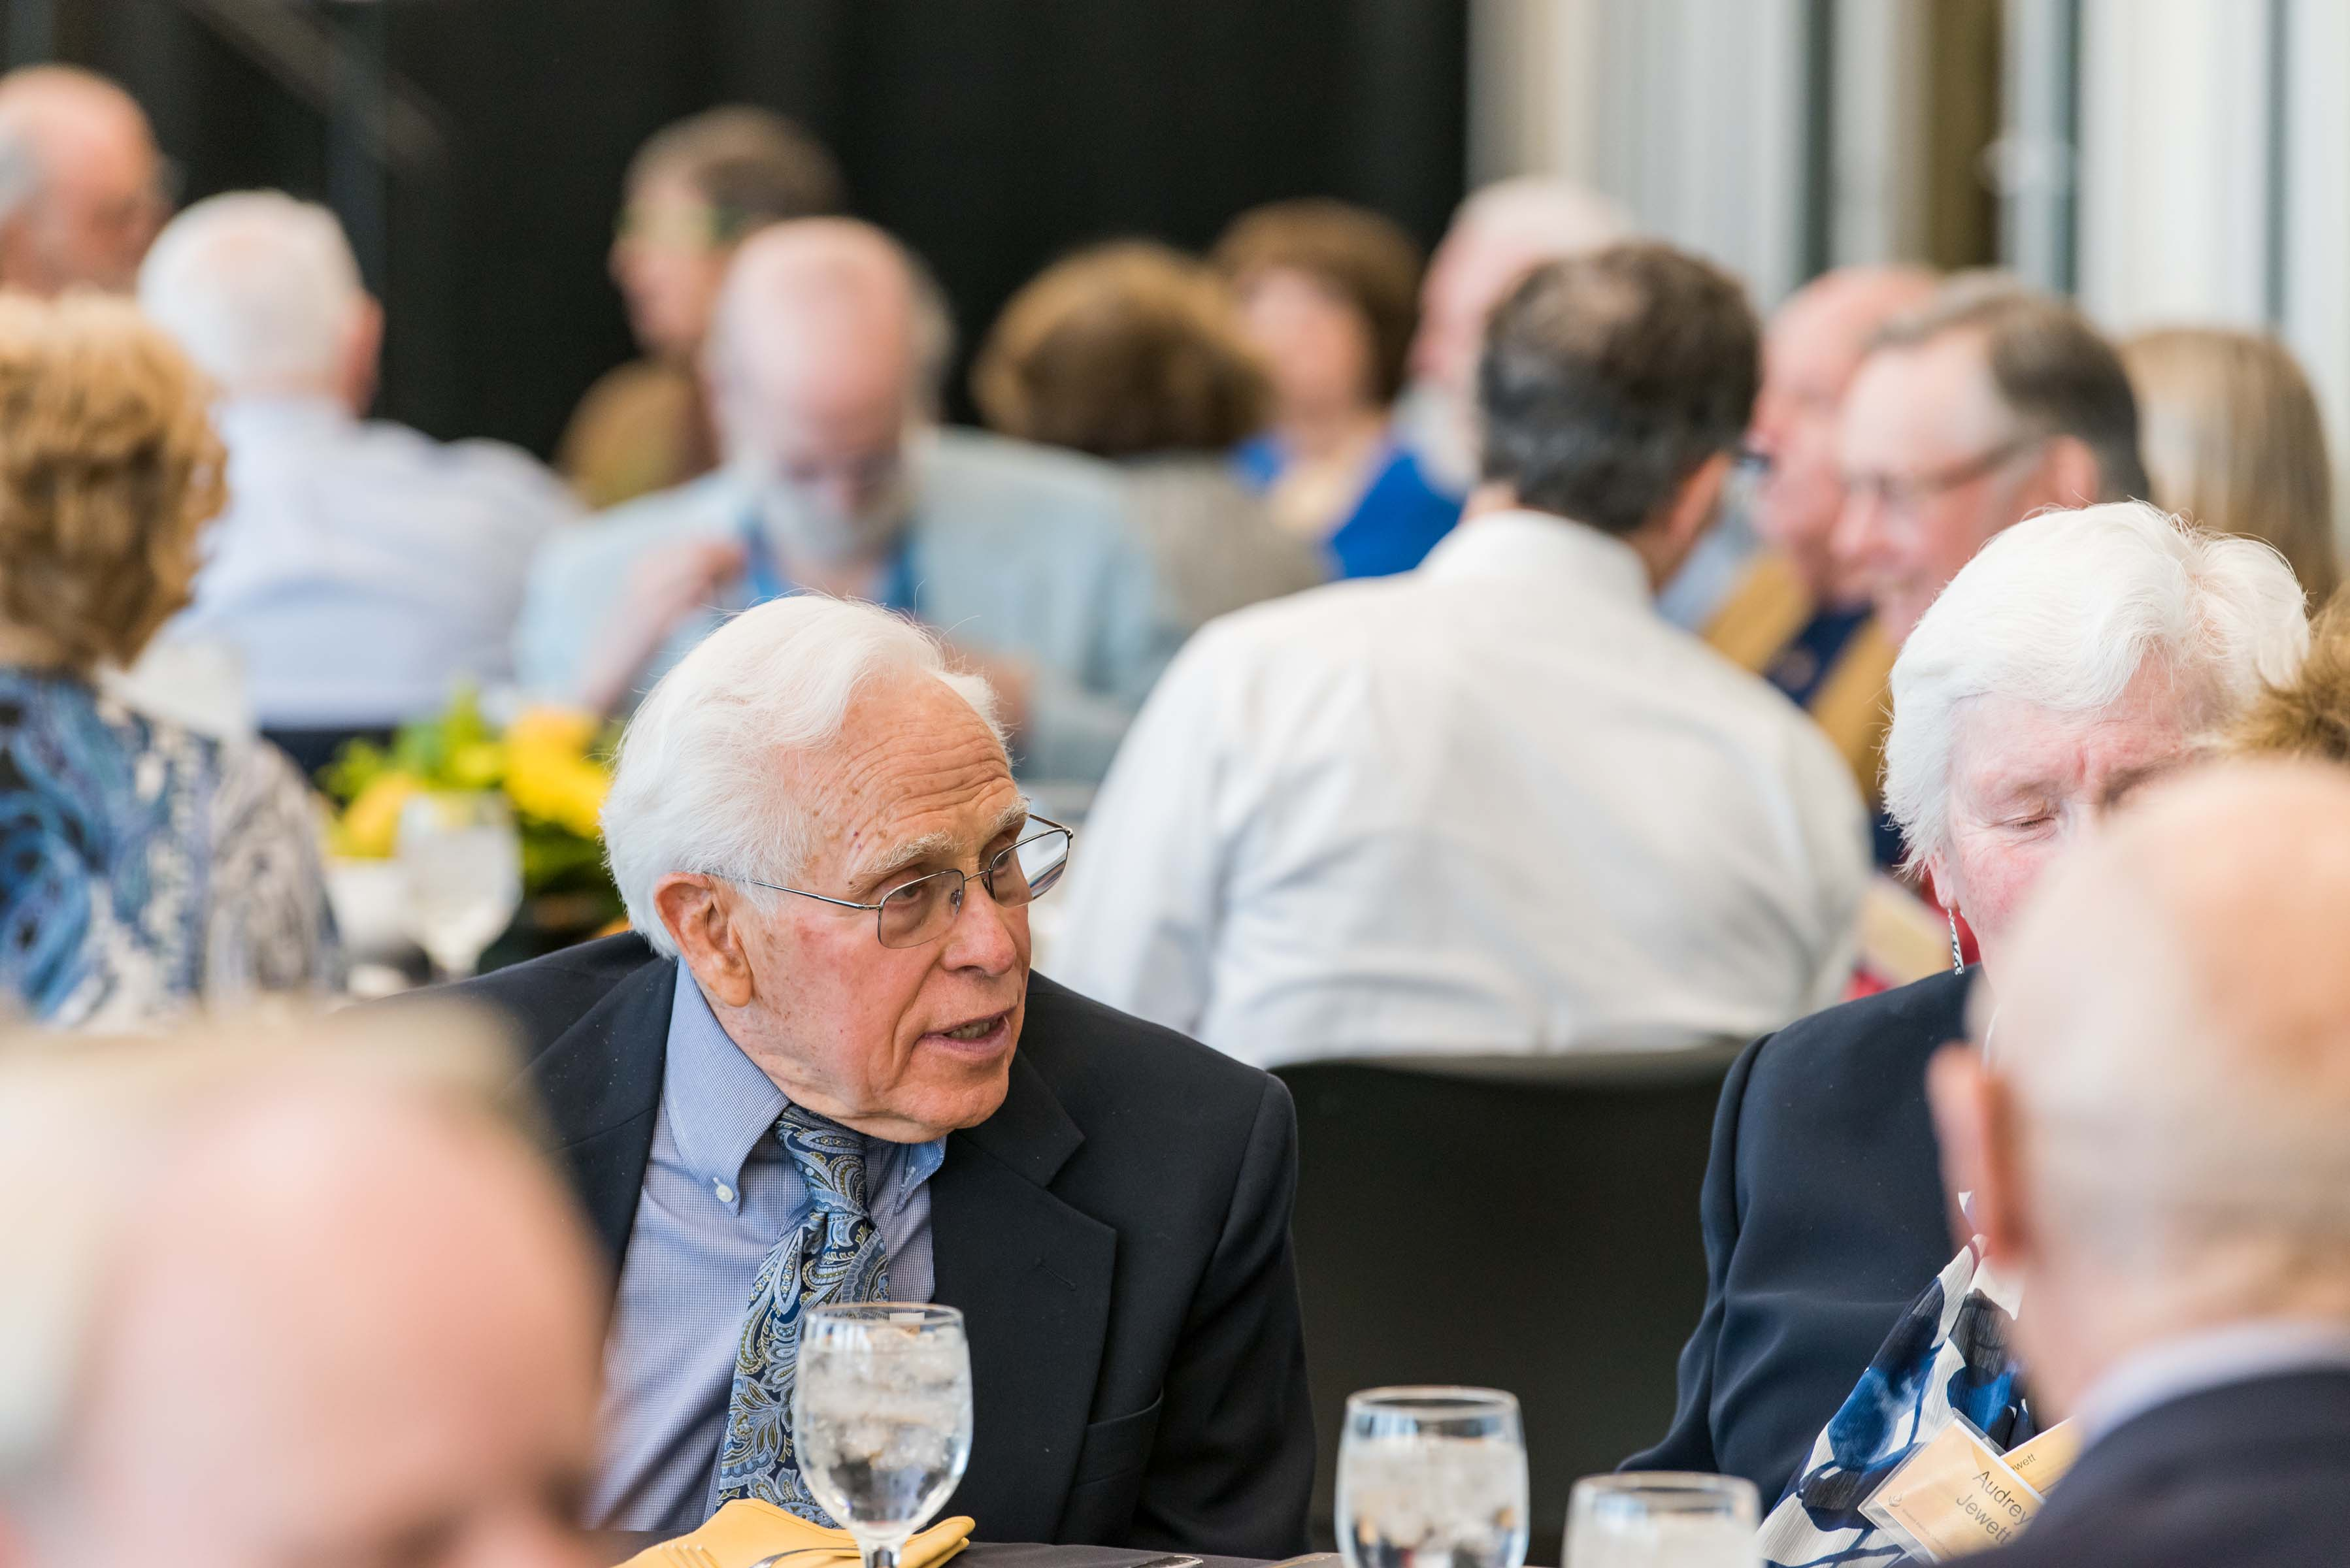 men talking at Wisdom Institute lunch